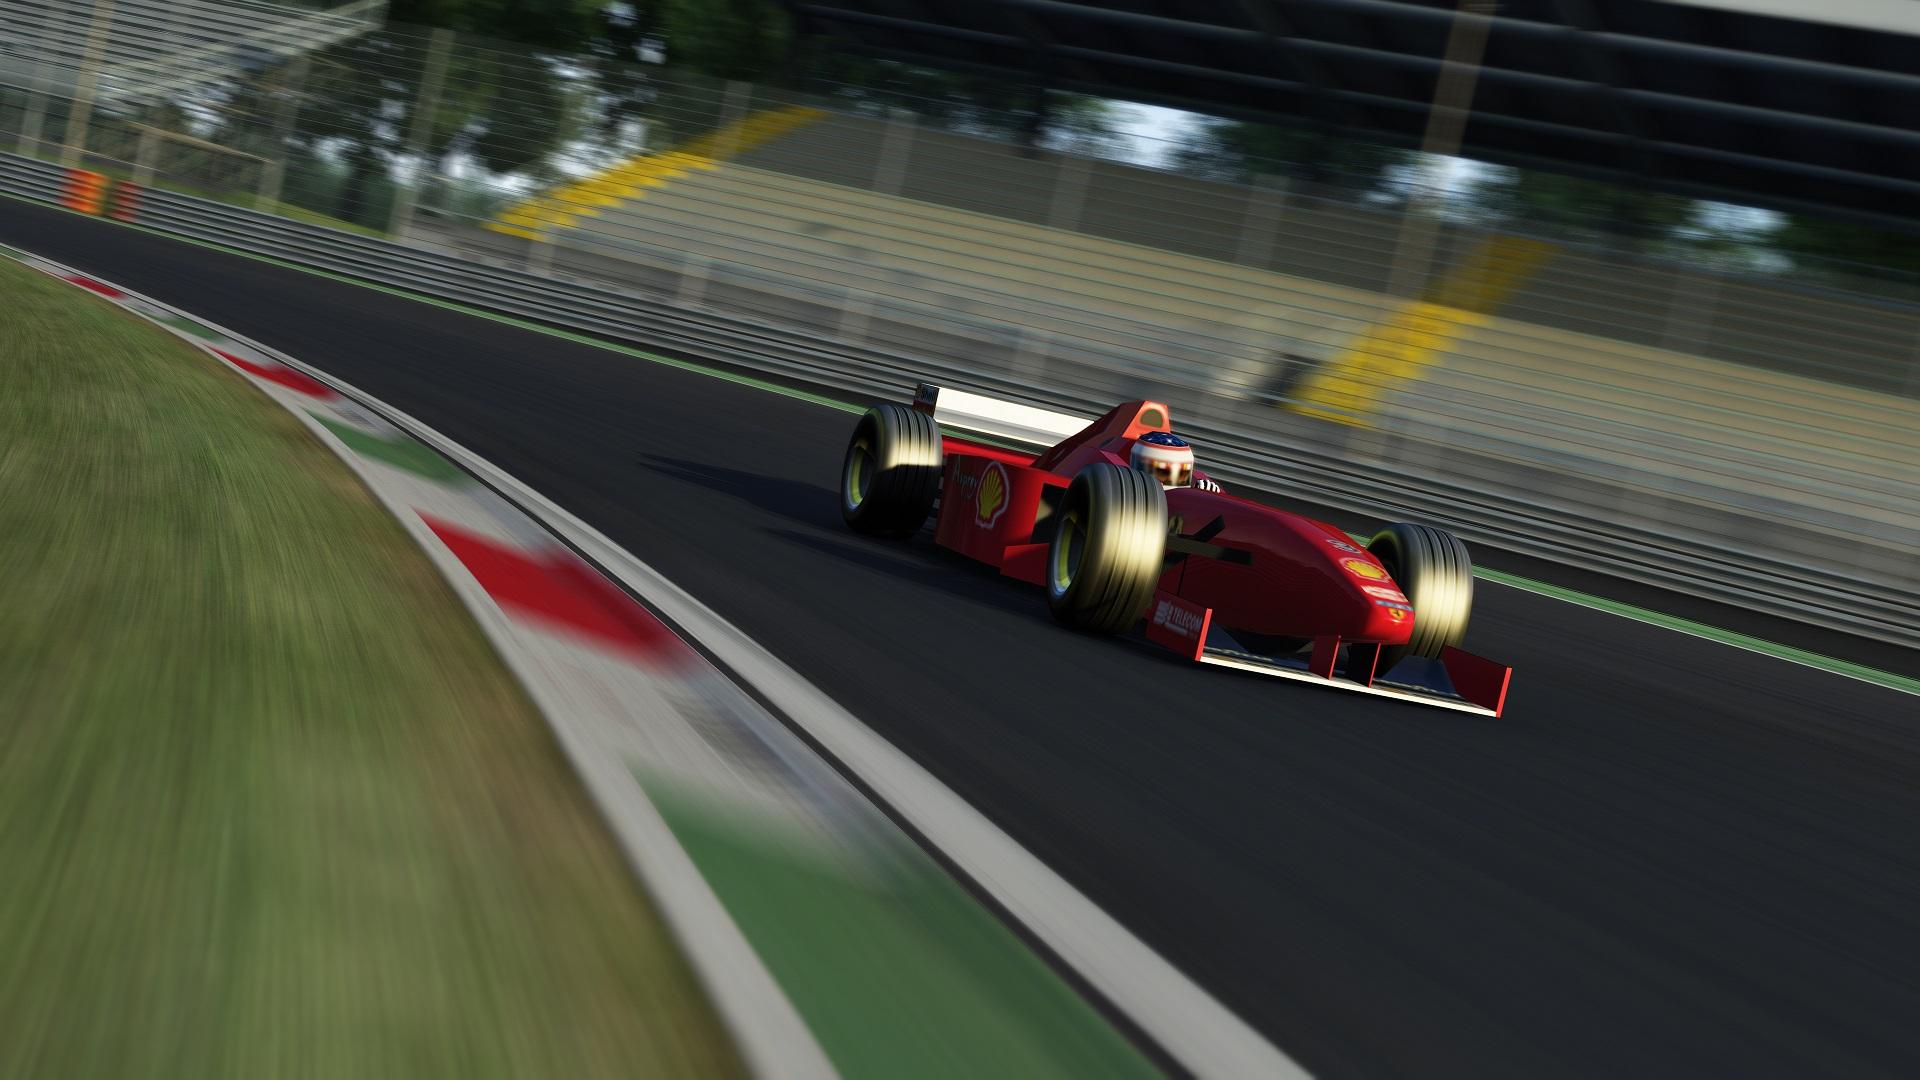 Screenshot_grand_prix_racer_monza_1-11-120-20-39-48.jpg